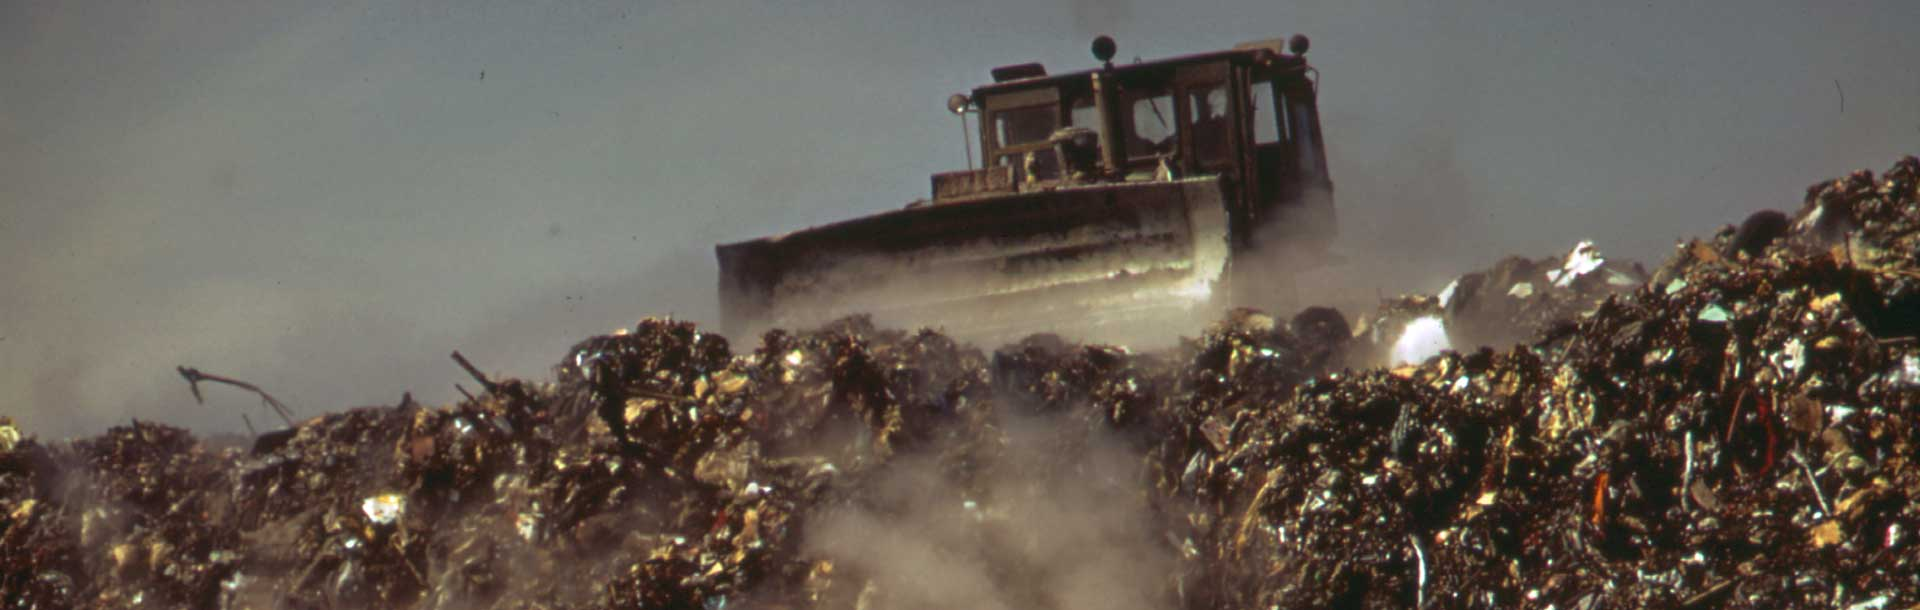 Reducing Food Waste: 1 In 5 Acres Of Land In US Is Growing Garbage thumbnail